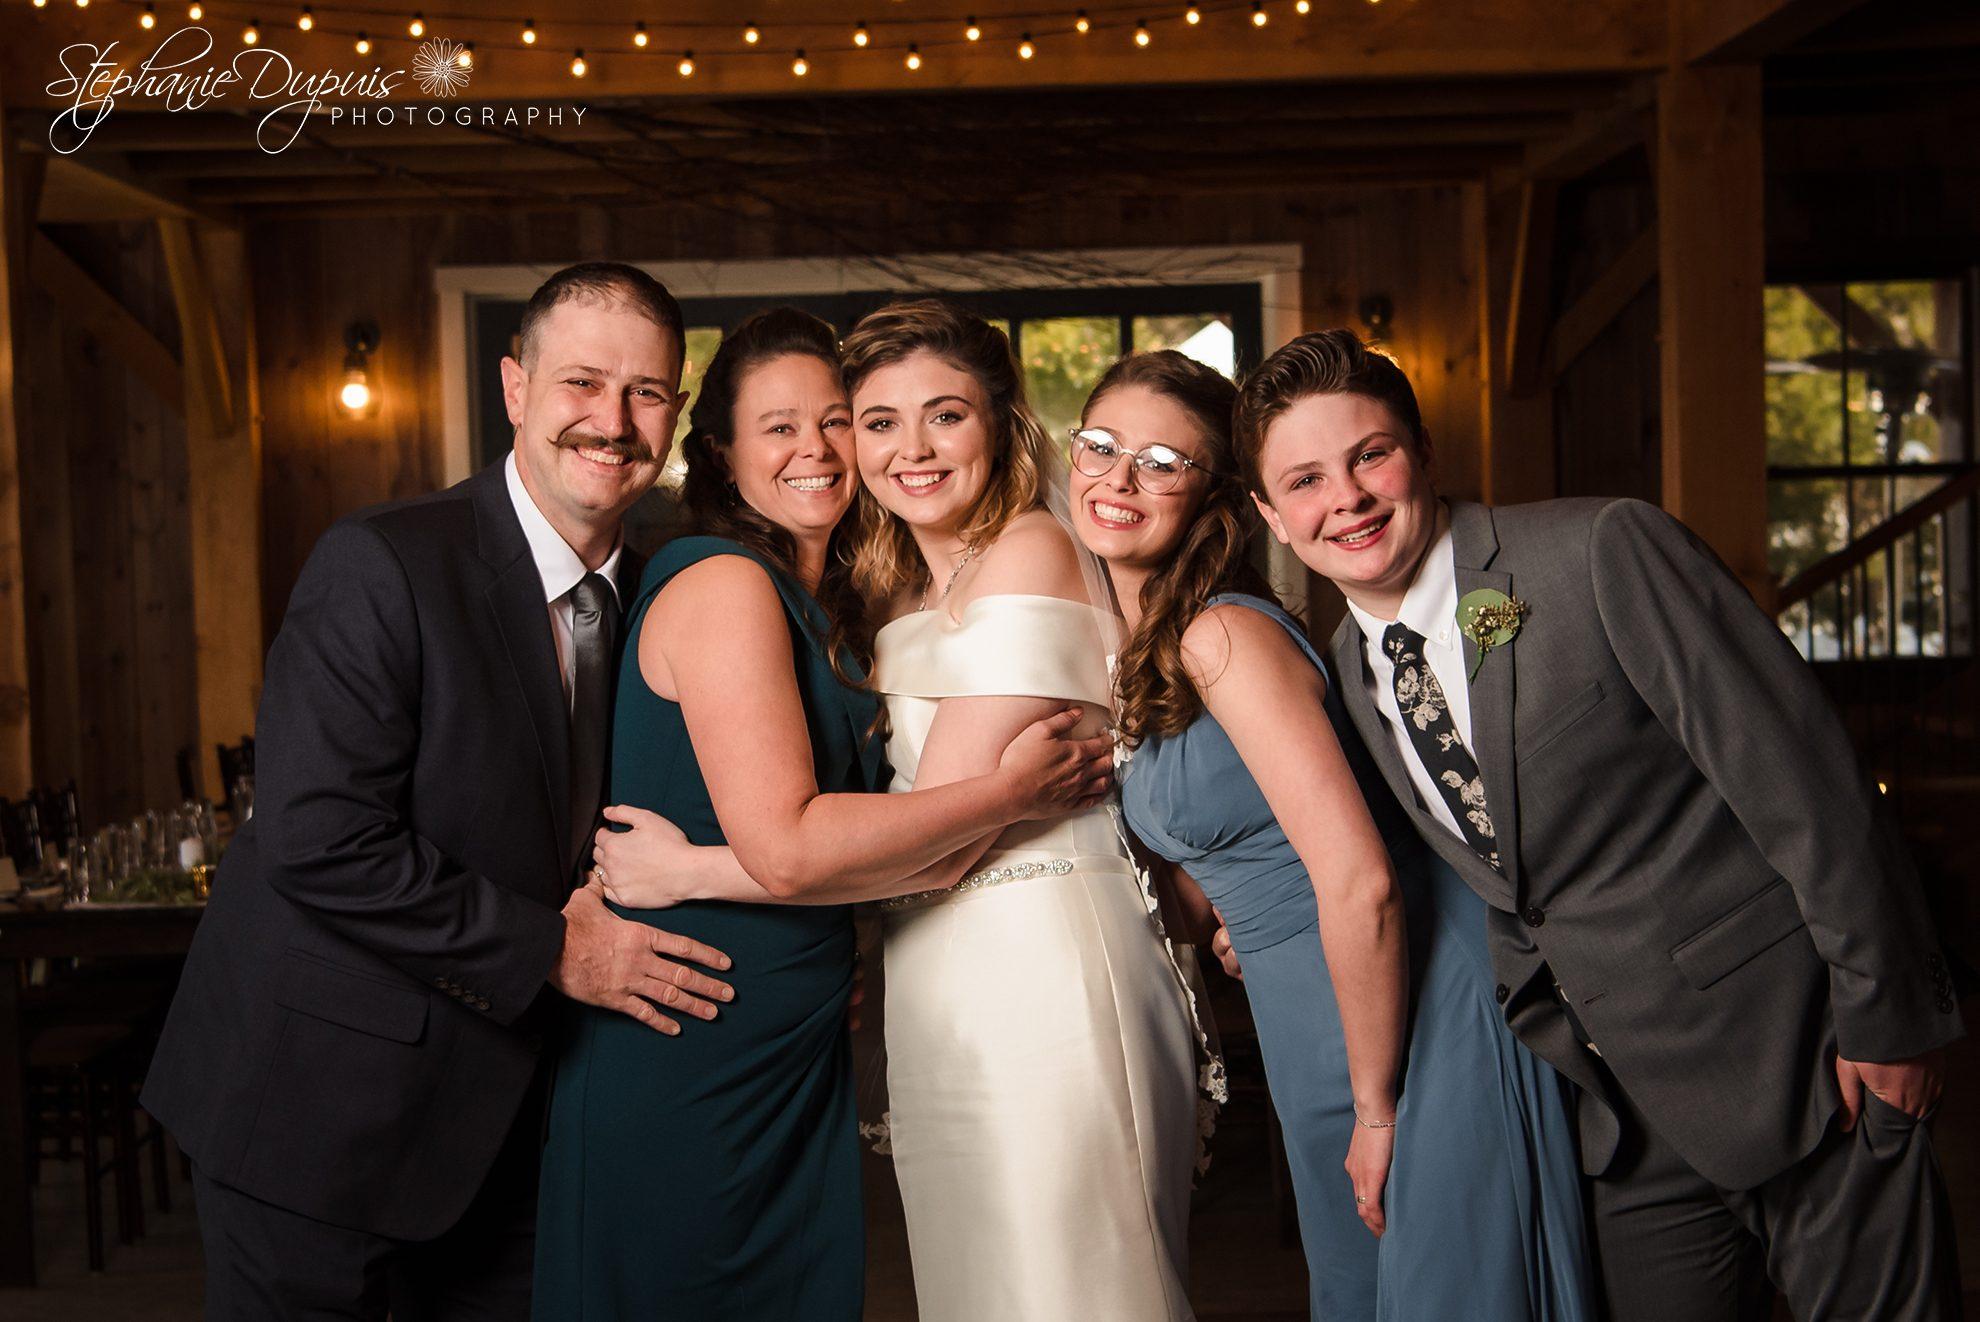 Lancaster Wedding Photographer 03 3 - Portfolio: Kittle Wedding